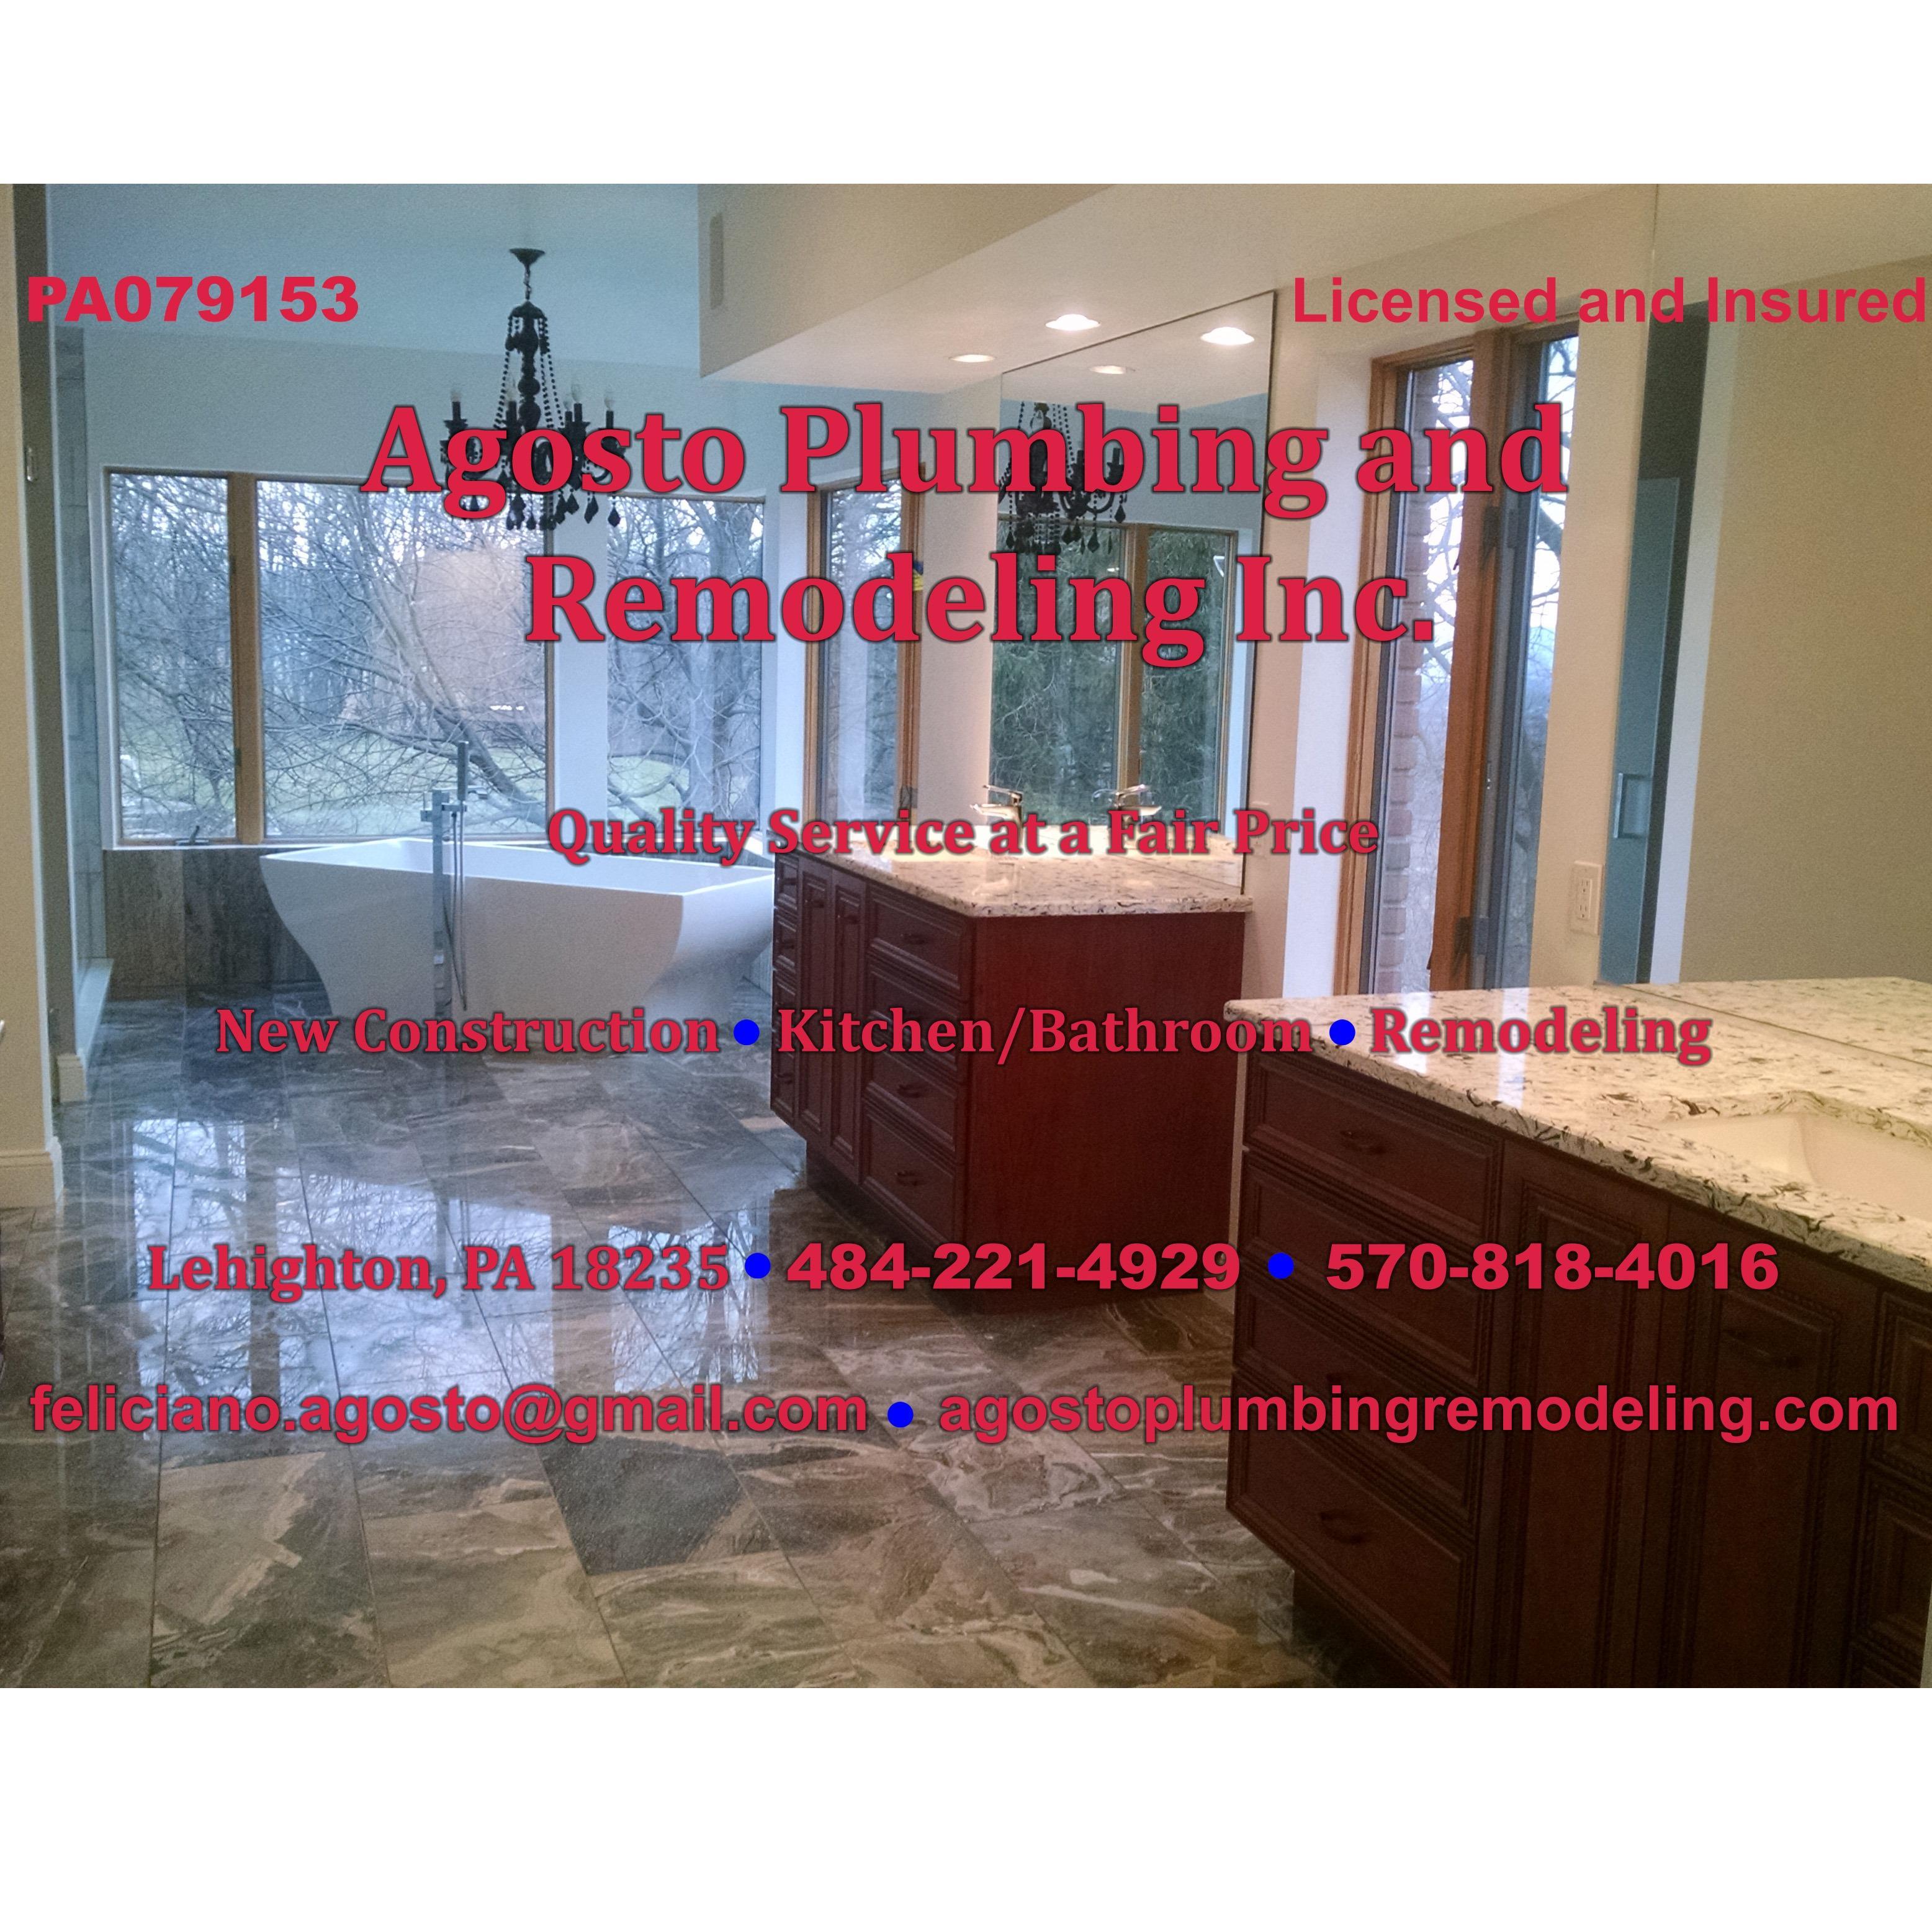 Agosto Plumbing & Remodeling Inc.